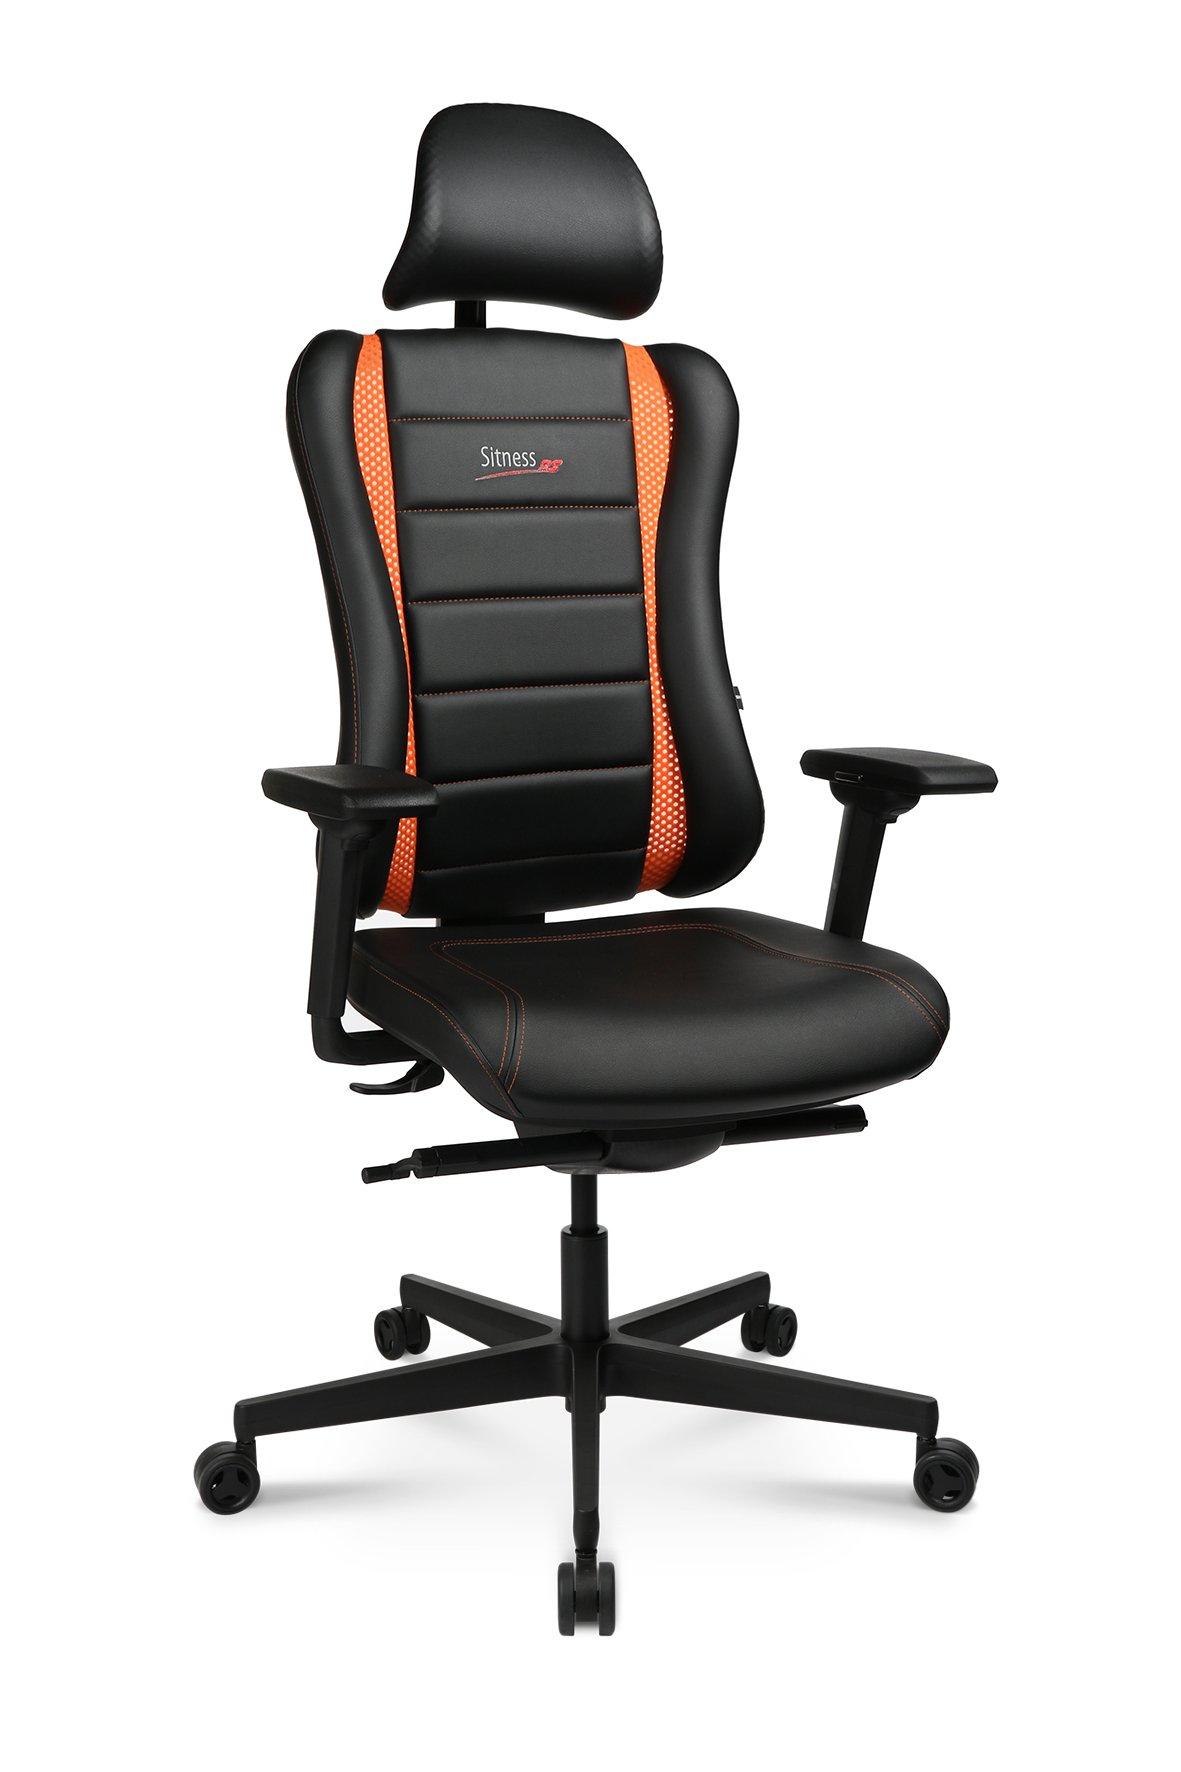 Drehstuhl Sitness RS Pro,schwarz / orange,Kunststoff / Polyamid